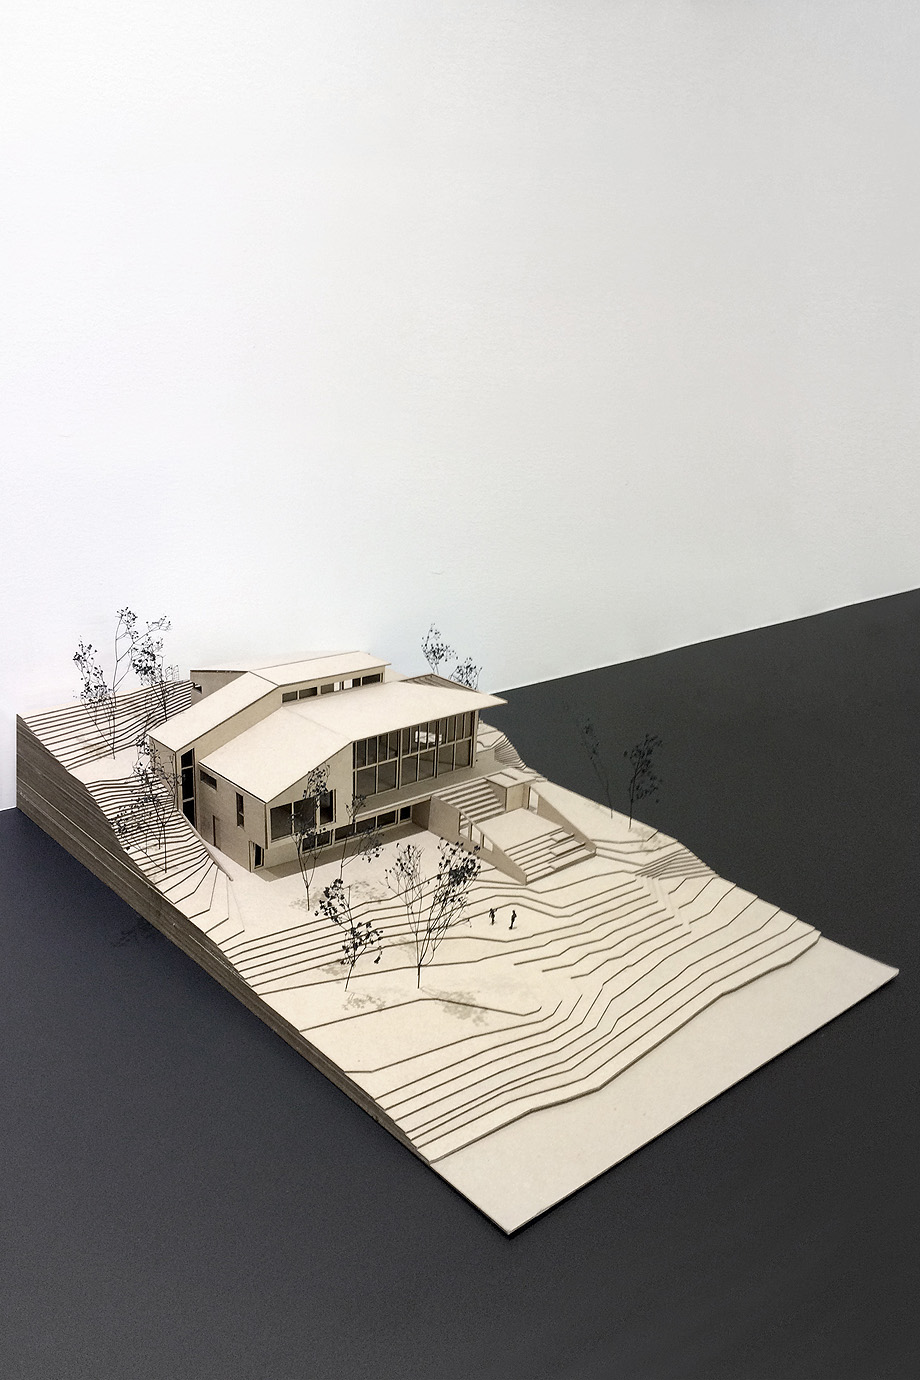 casa accostee de bourgeois lechasseur architects - foto adrien williams (18)